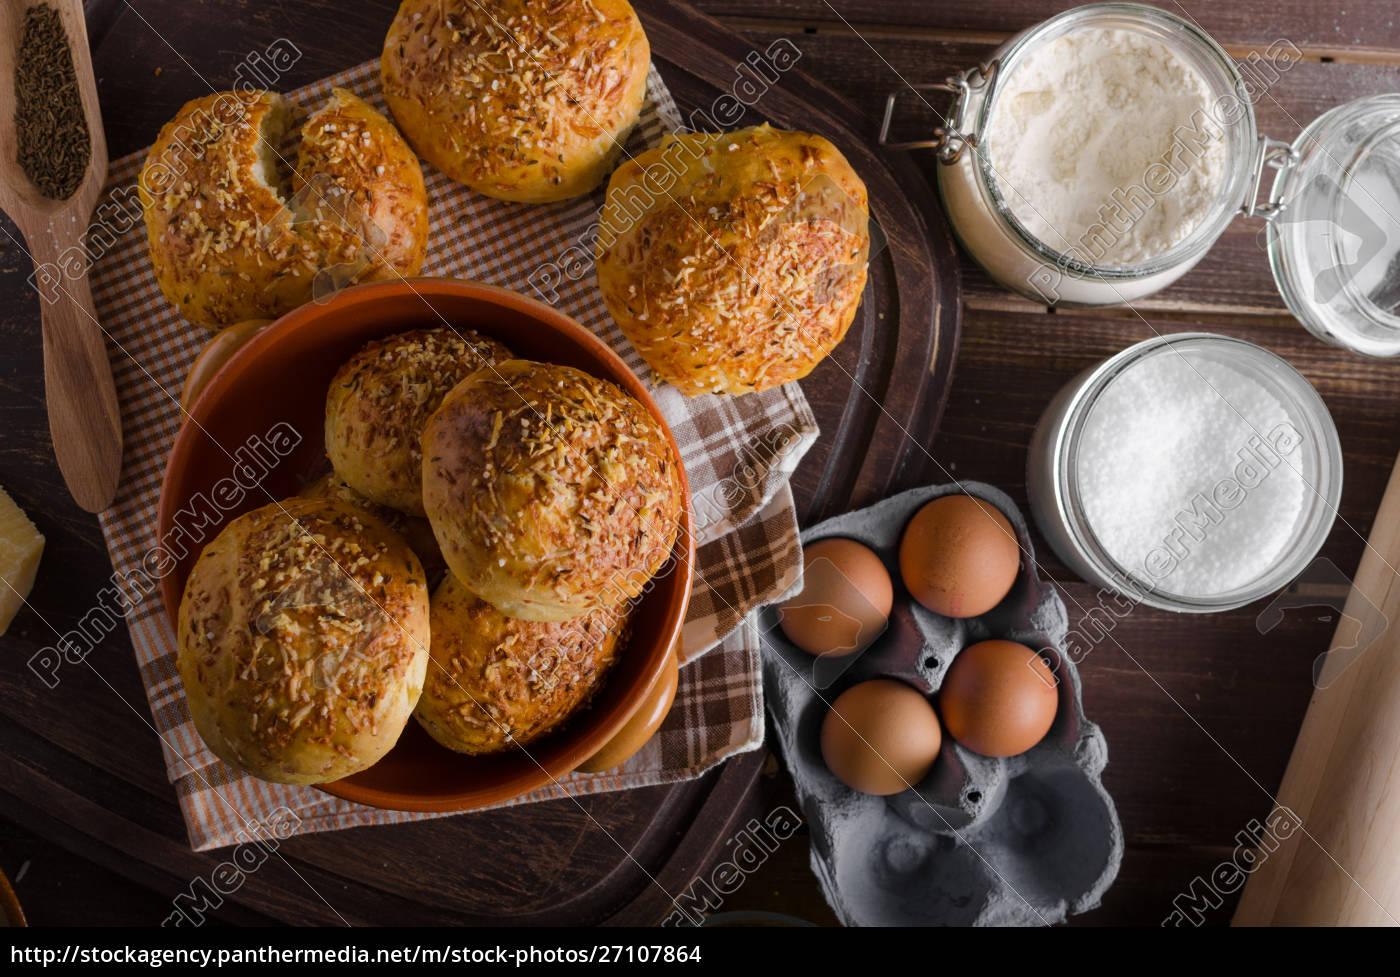 homemade, cheese, buns - 27107864